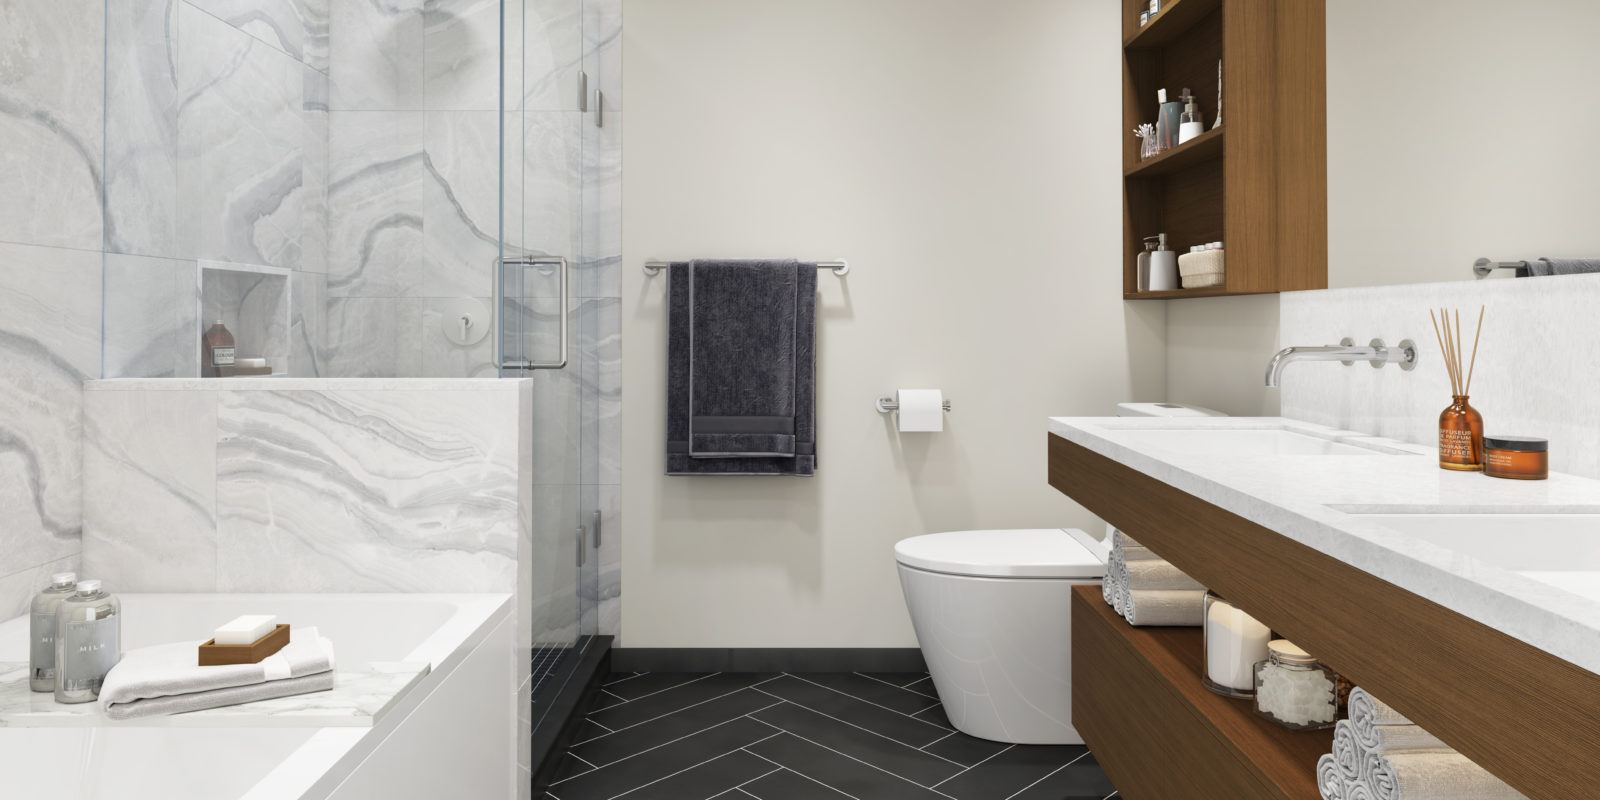 2017 11 15 bathroom final 1600x800